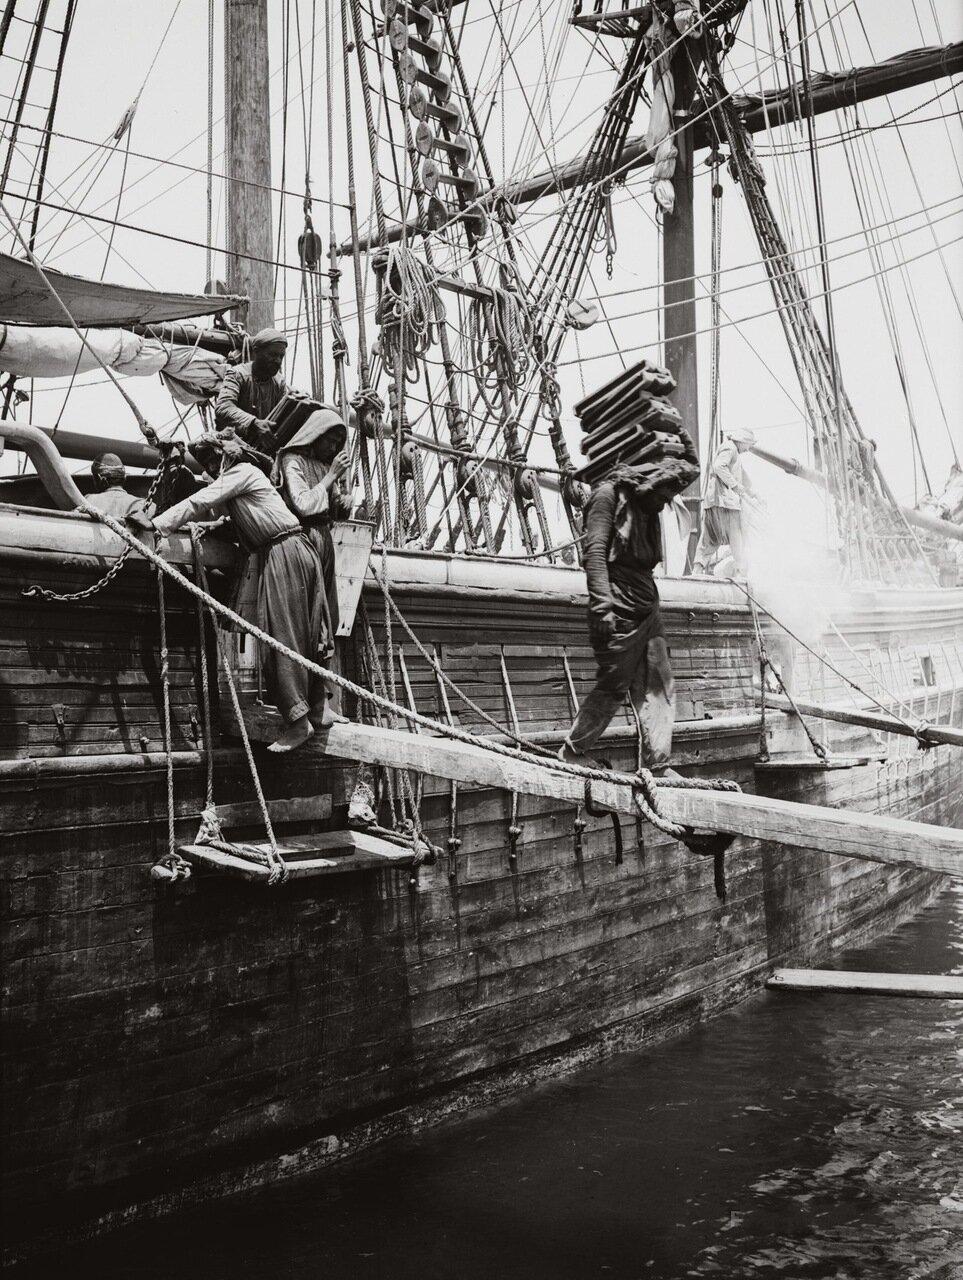 Разгрузка судна в порту. Бейрут, Ливан. 1900-1920 гг.